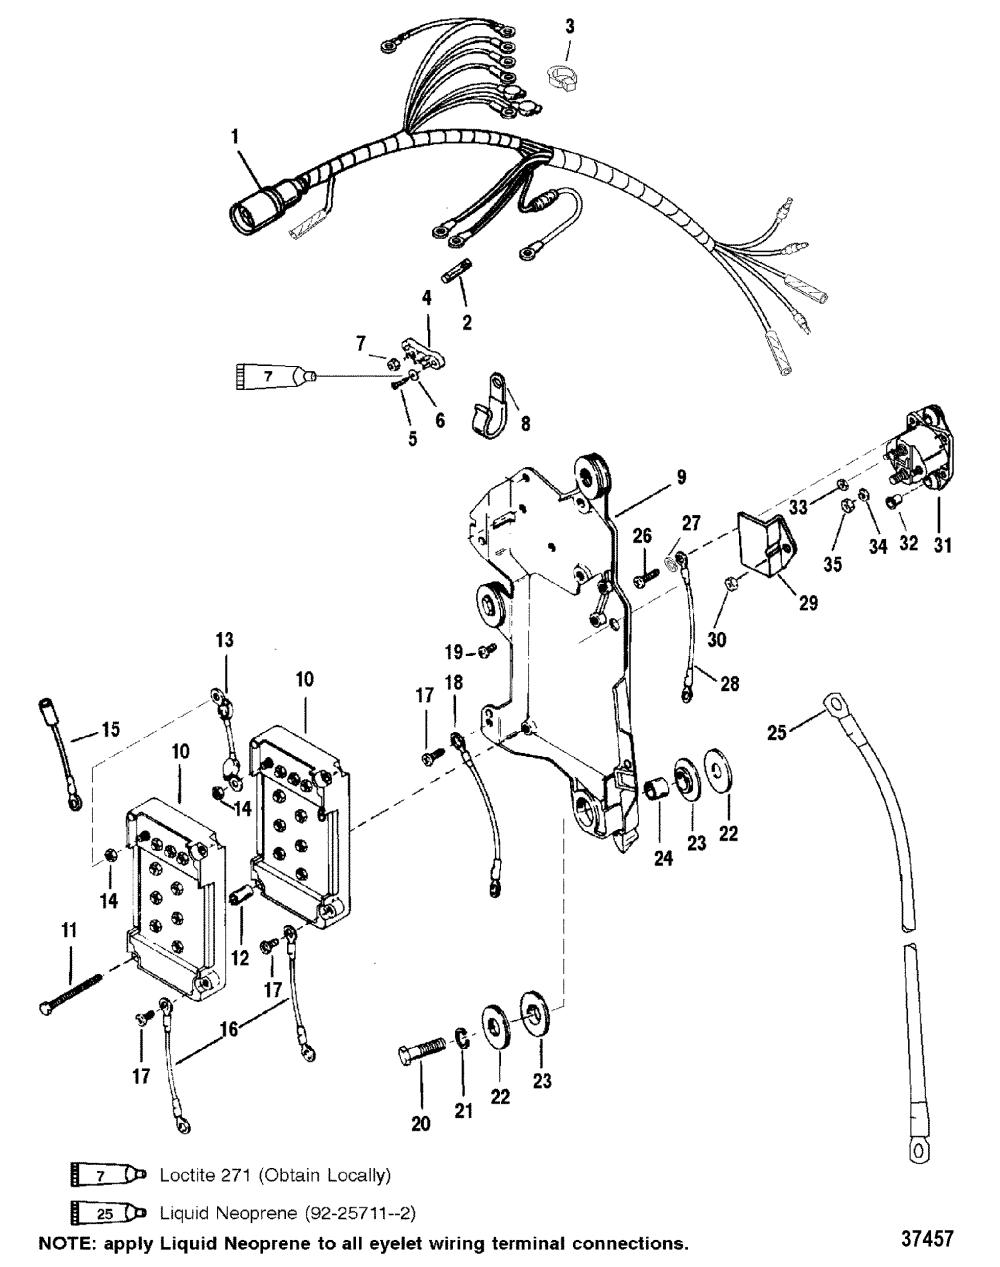 medium resolution of wiring harness starter solenoid for mariner mercury 150 175 200 efi zoom